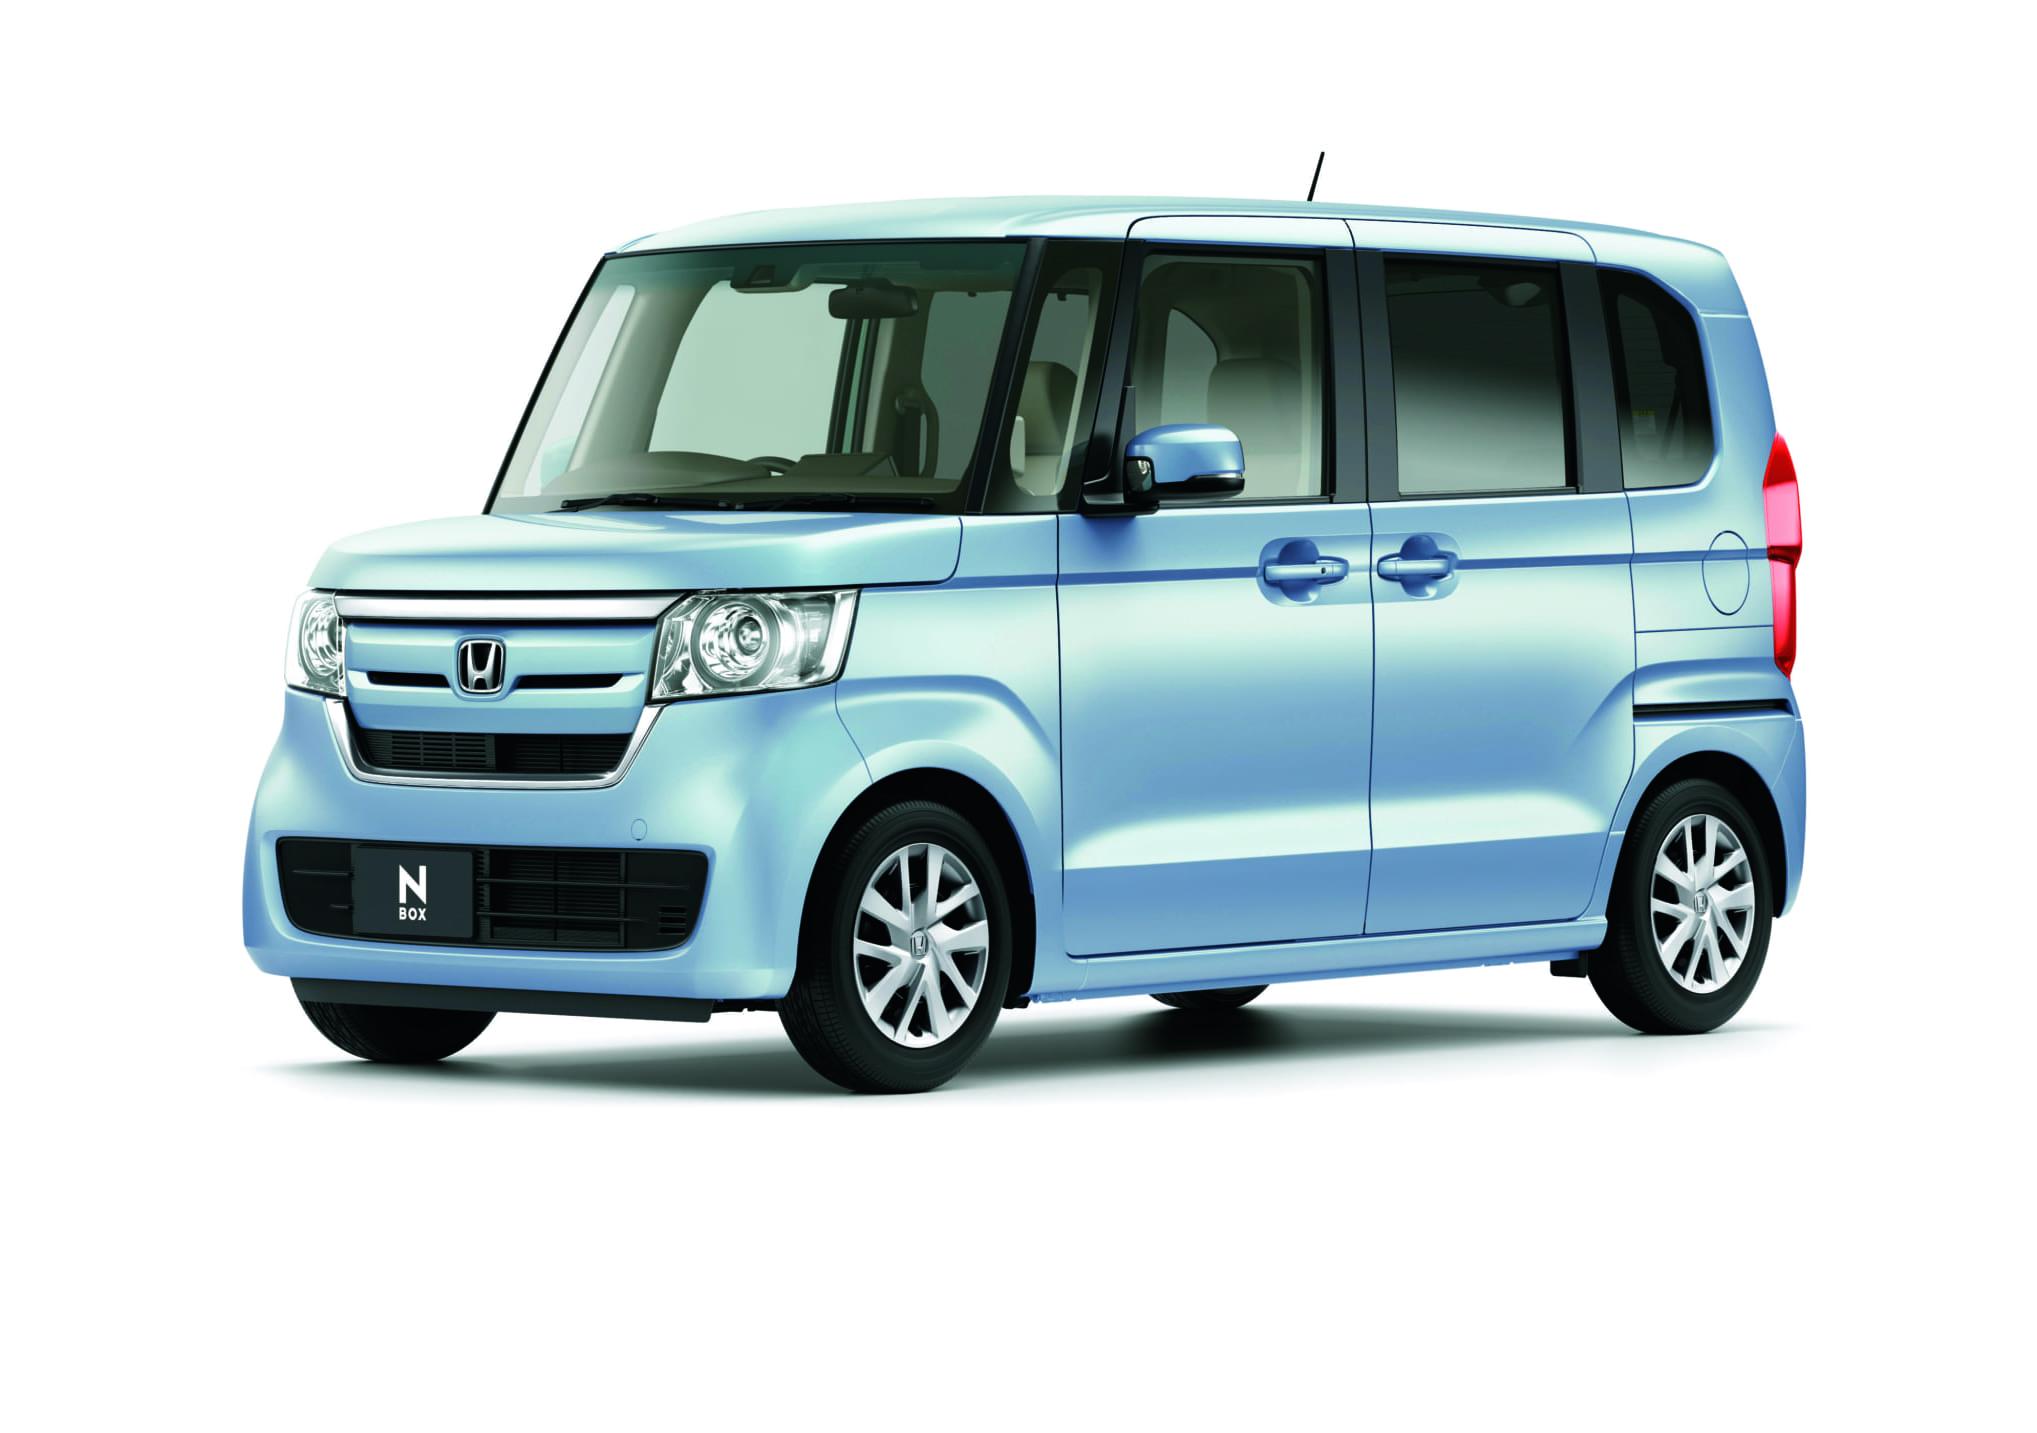 Honda_N-box_DBA-JF3_front_side